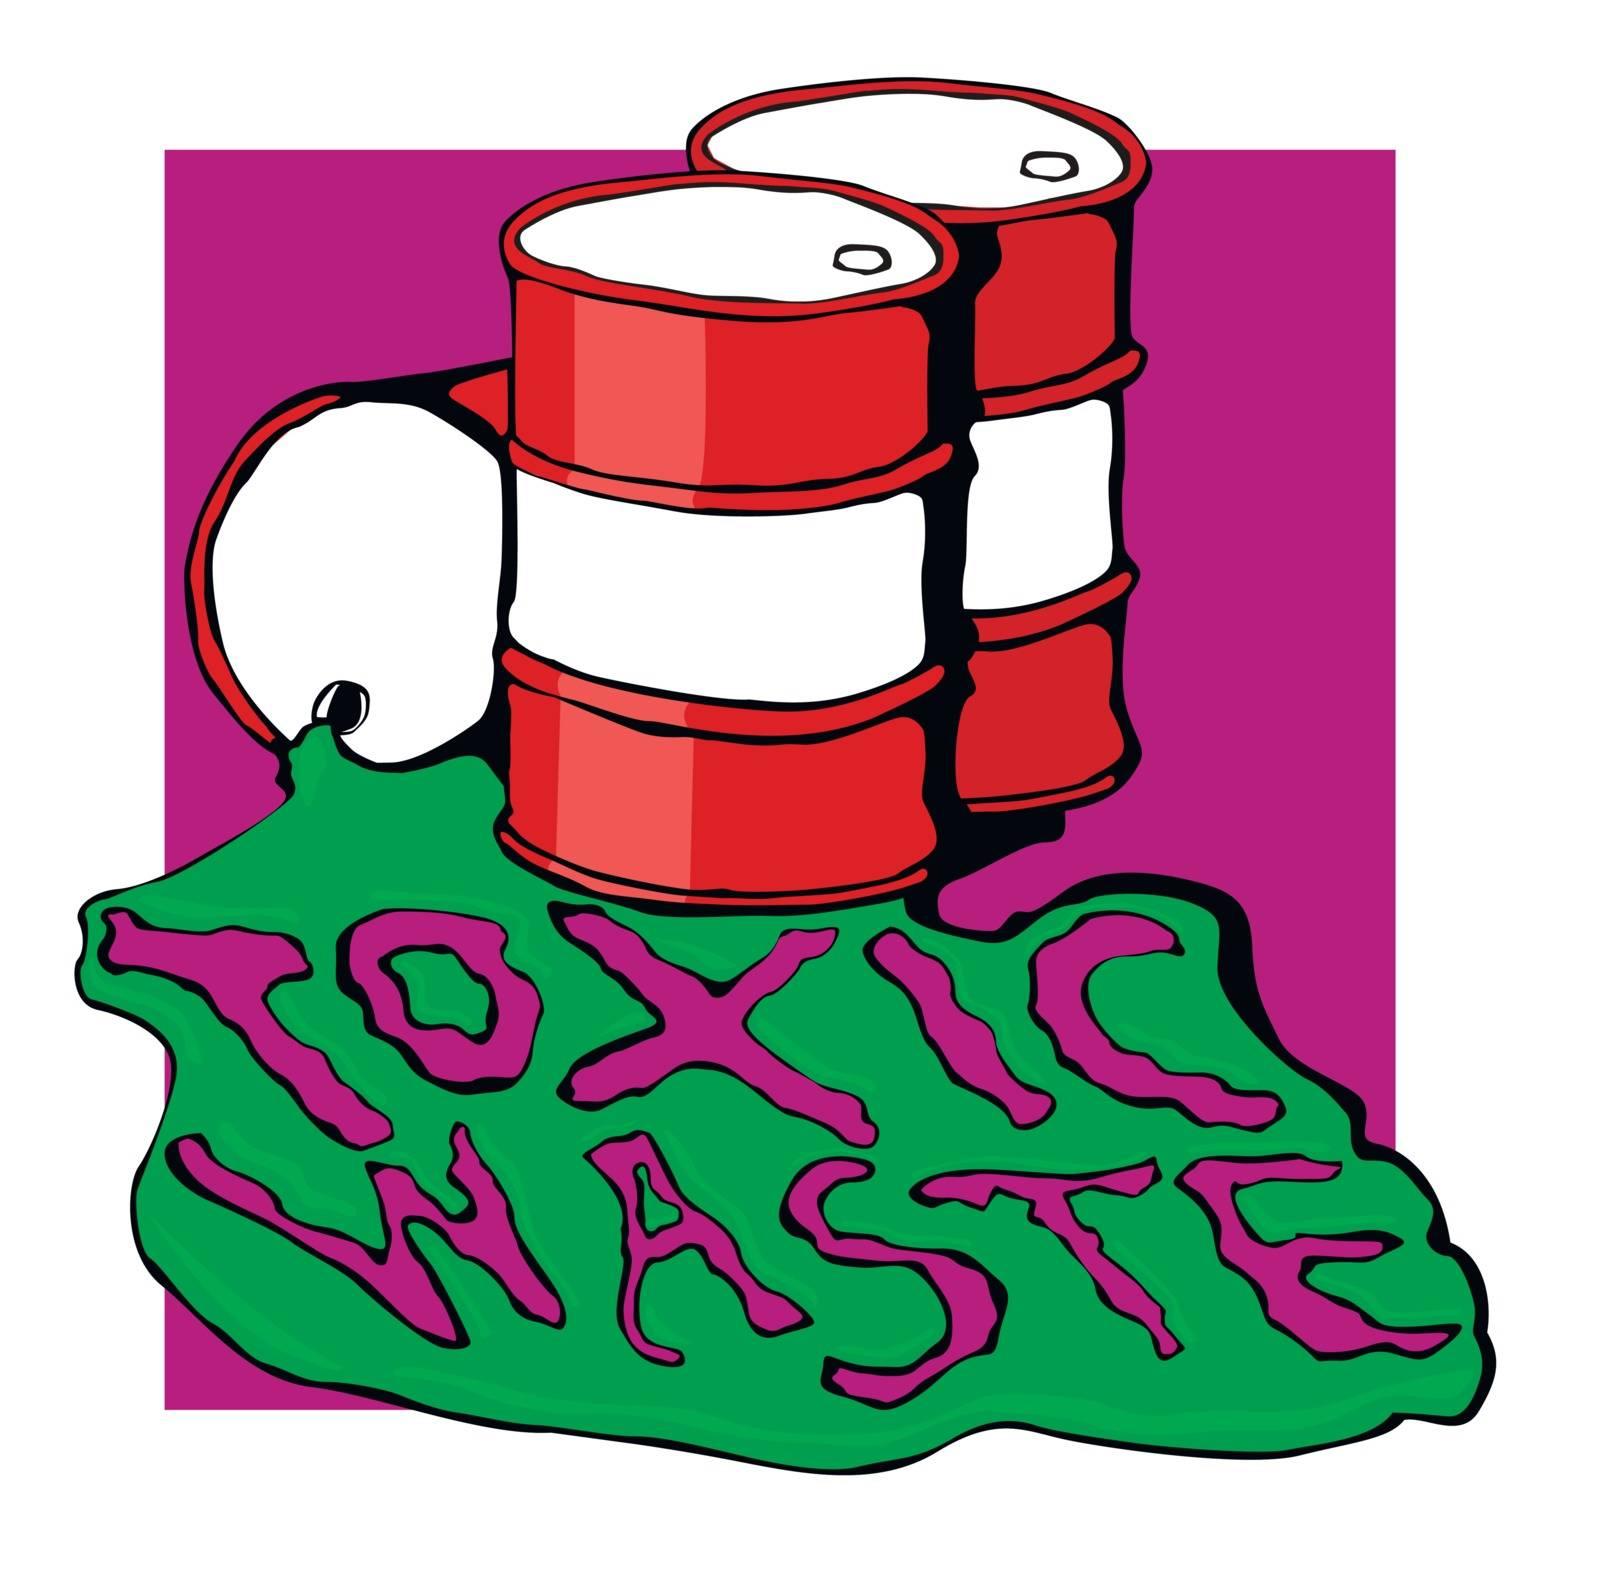 barrels of toxic waste. vector illustration